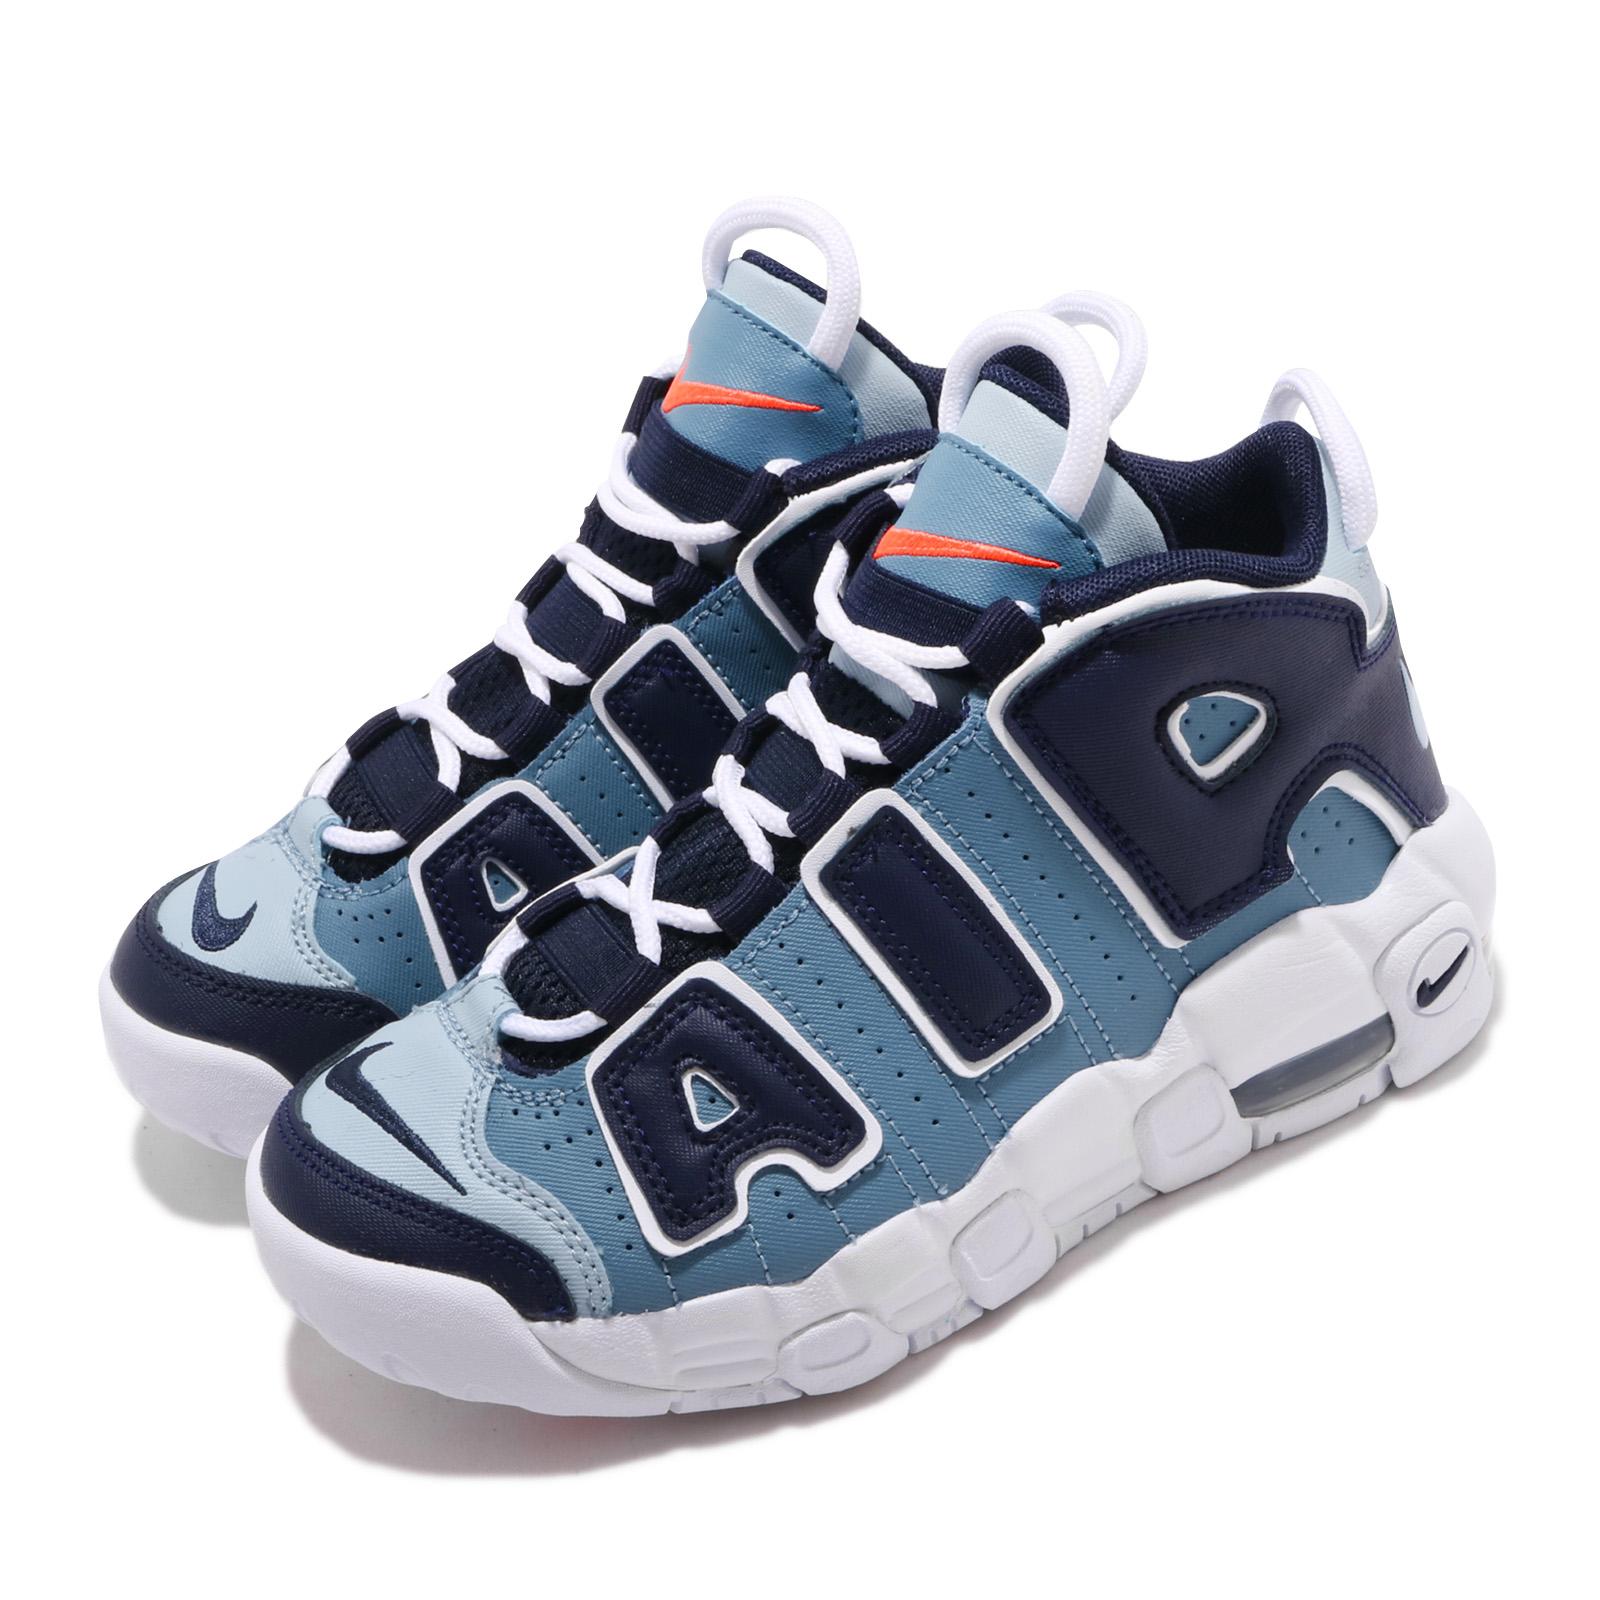 Nike 籃球鞋 Air More Uptempo 童鞋 AA1554-404